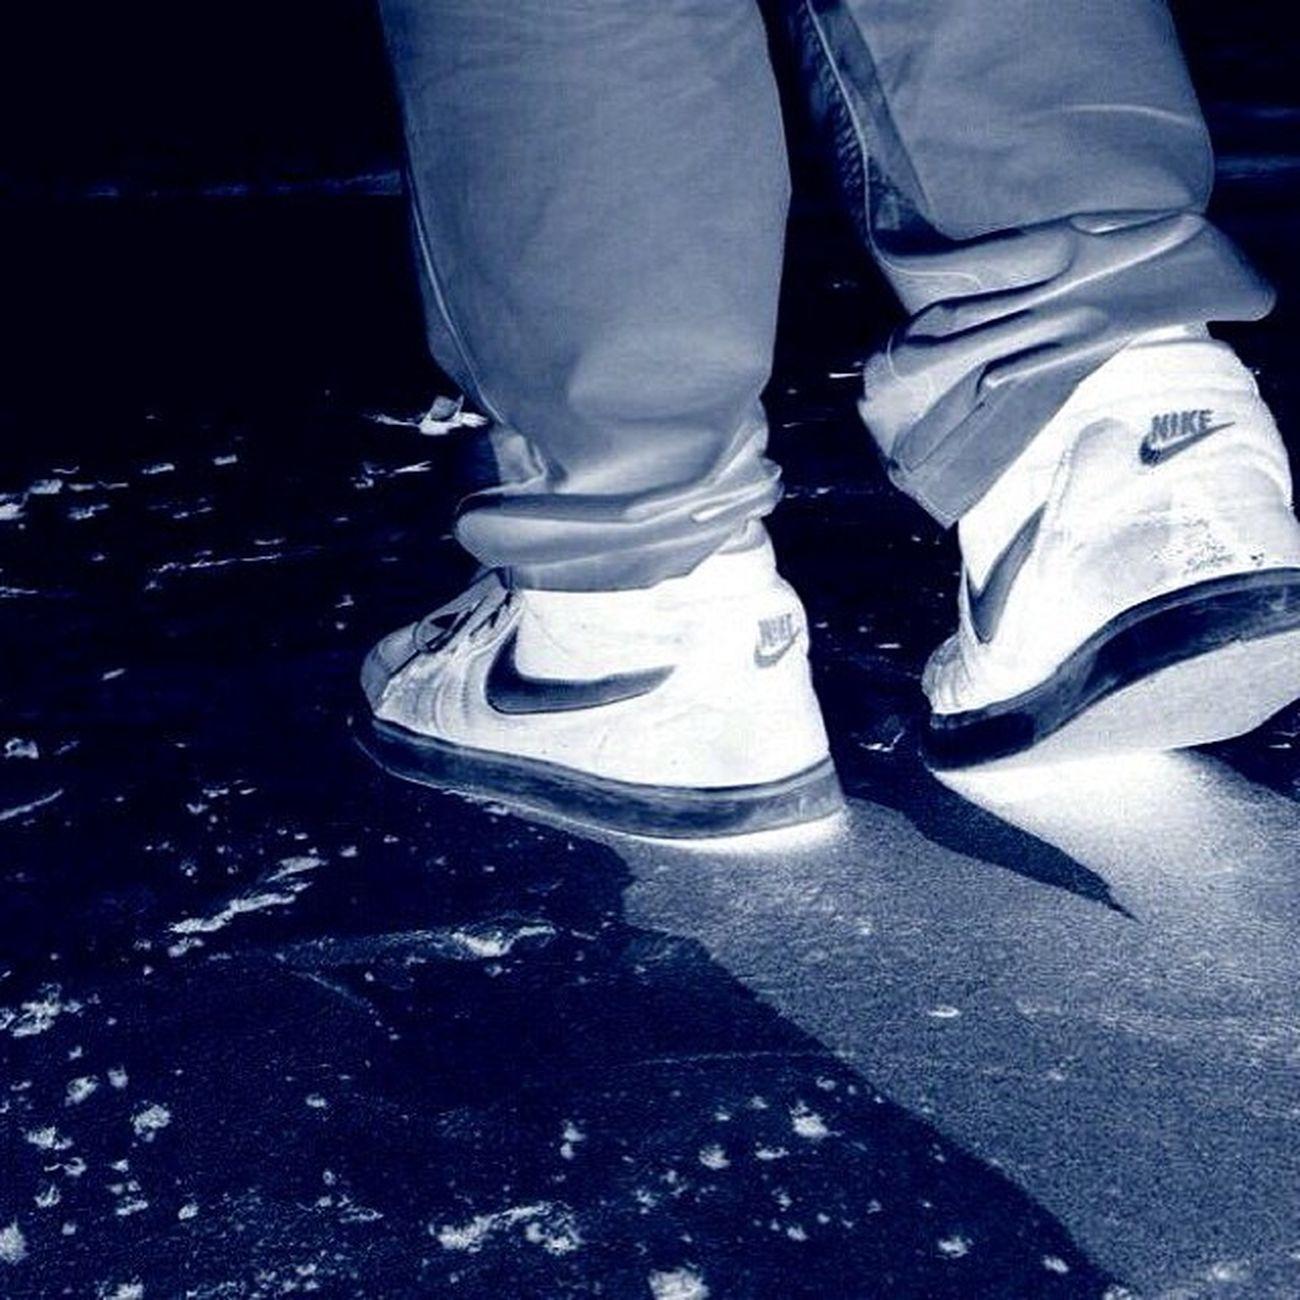 Shoes Shoe Kicks Tagsforlikes Instashoes Instakicks Sneakers Sneaker Sneakerhead  Sneakerheads Solecollector Soleonfire NiceKicks  Igsneakercommunity Sneakerfreak SneakerPorn ShoePorn Fashion Swag Instagood Fresh Photooftheday Nike Sneakerholics Sneakerfiend shoegasm kickstagram walklikeus peepmysneaks flykicks